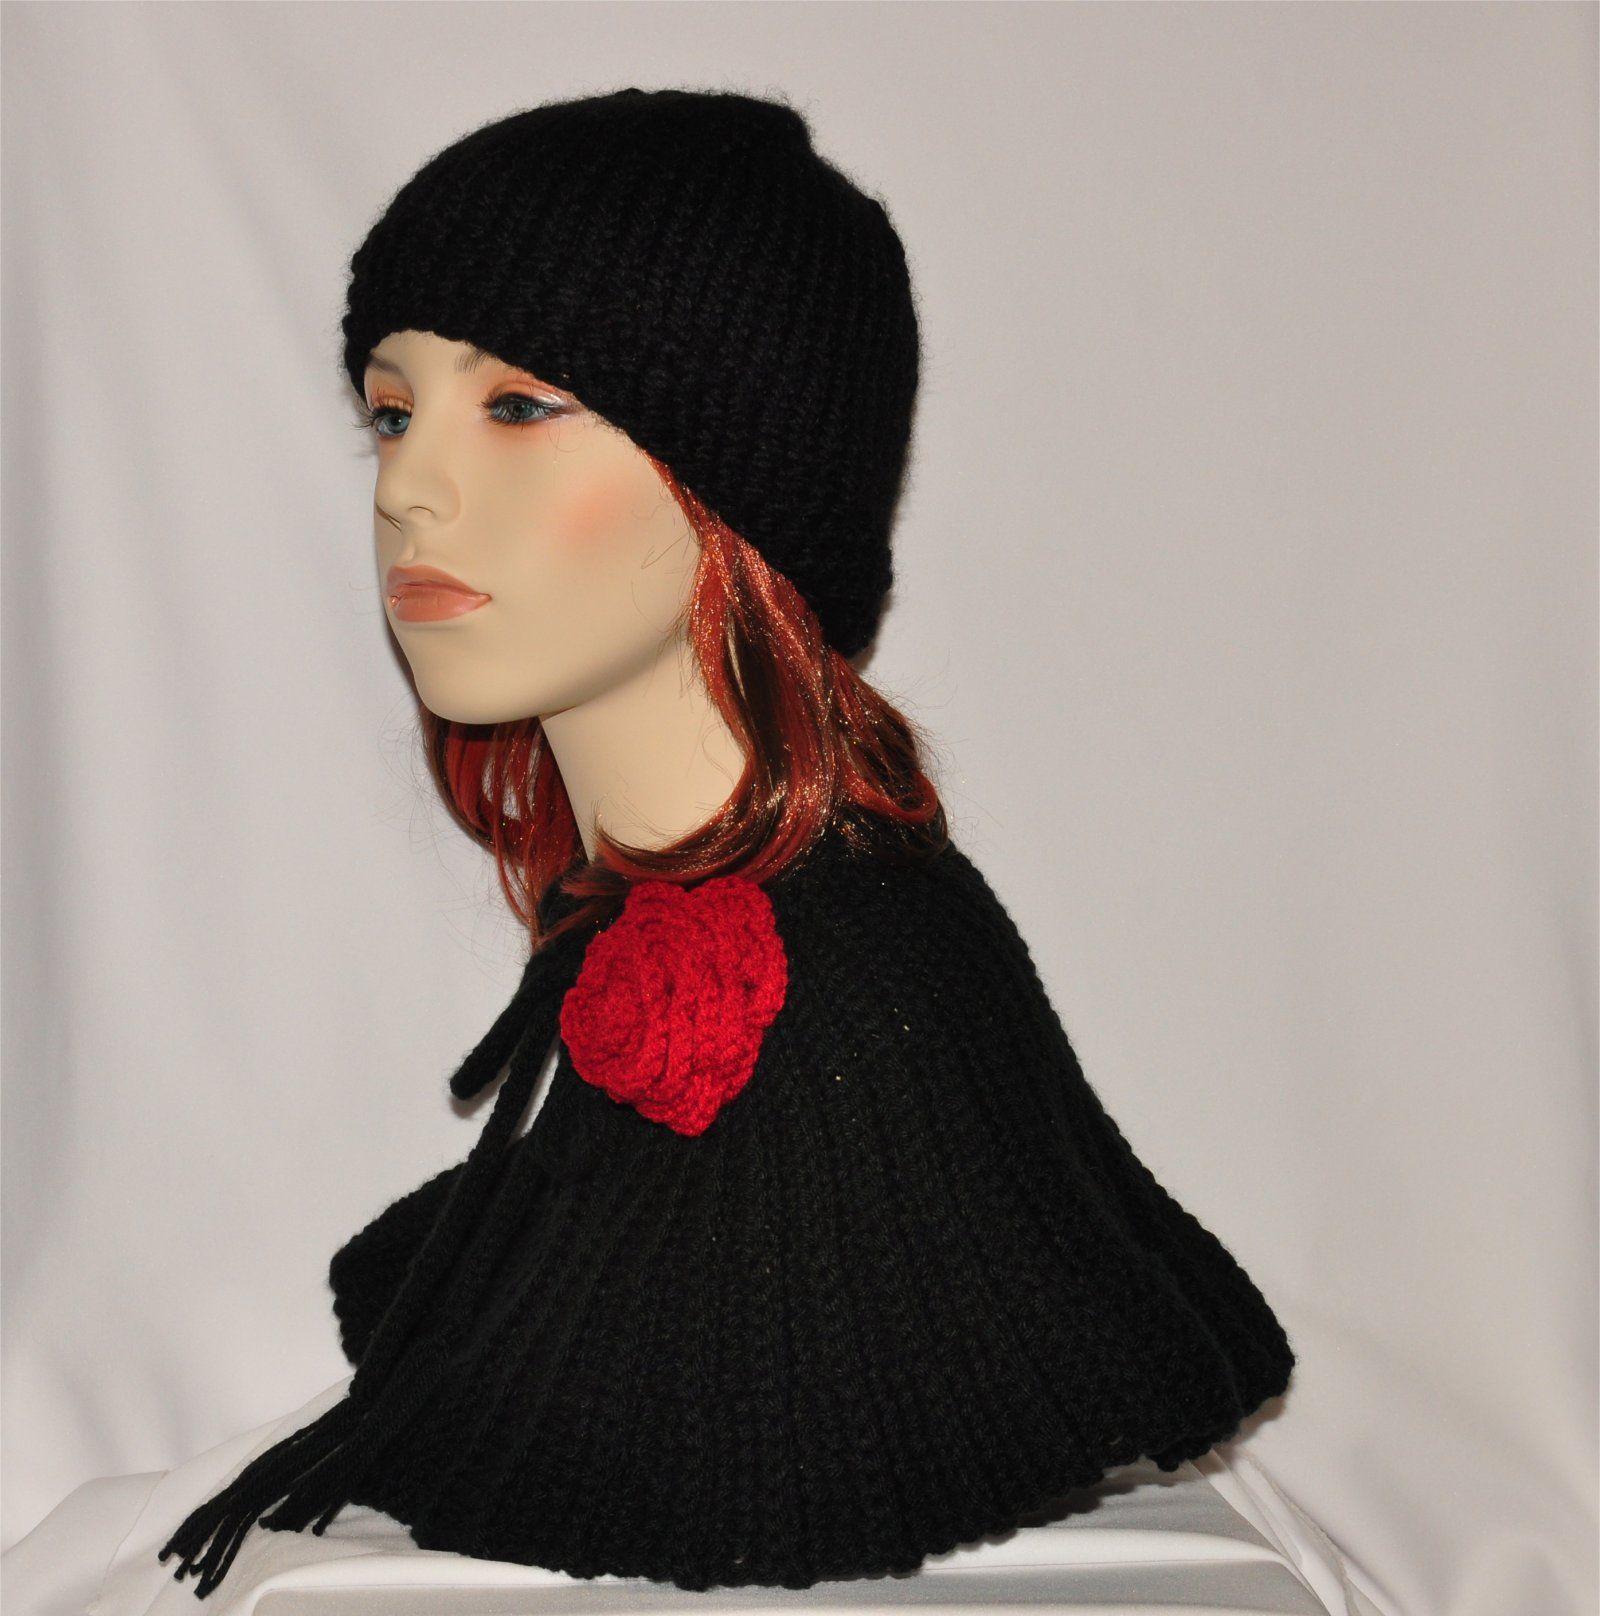 Crochet neck warmer and hat set